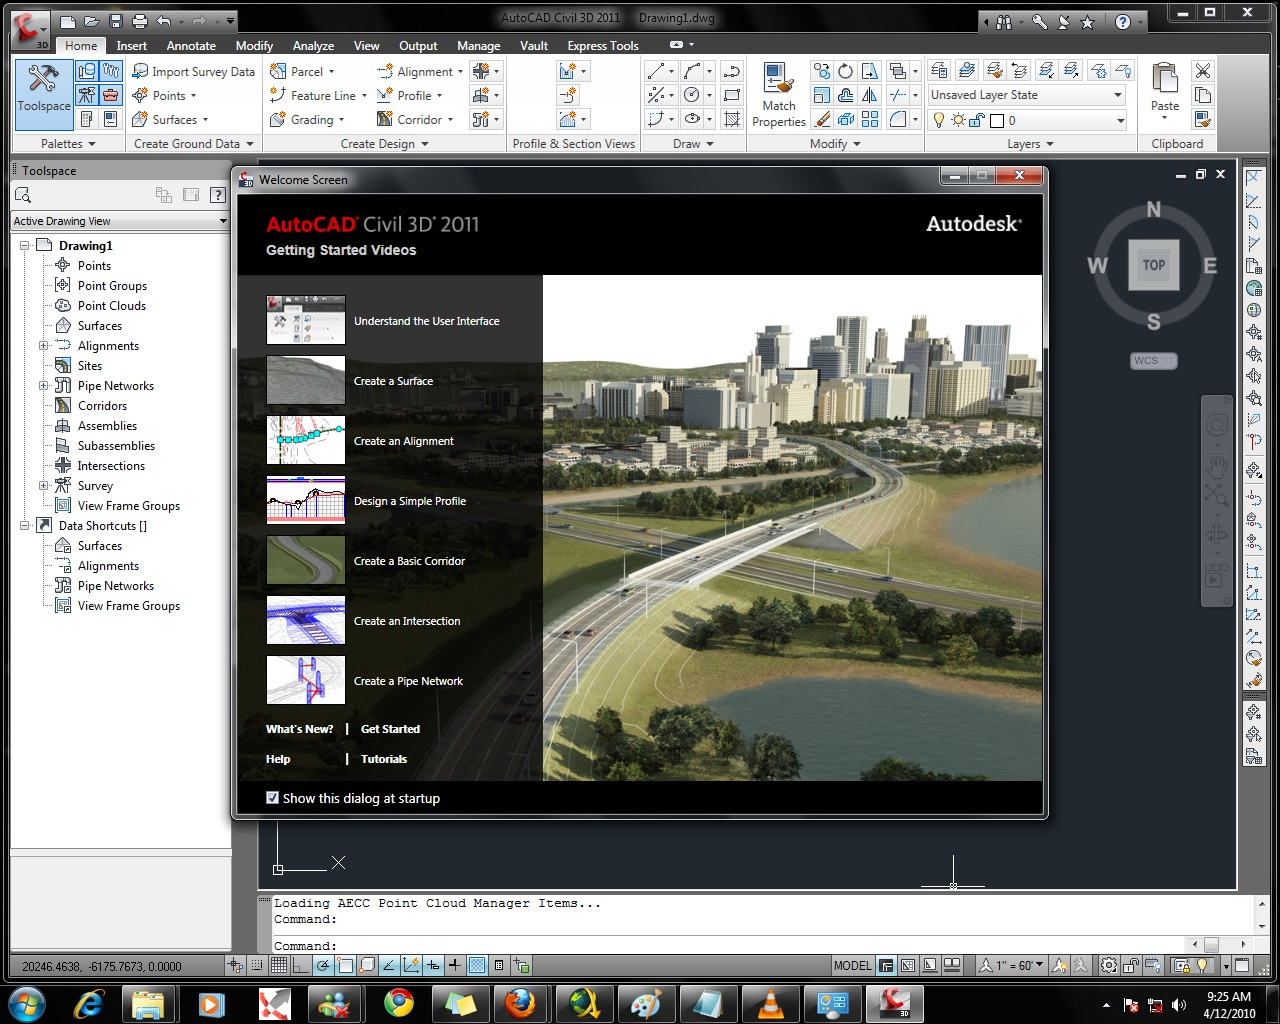 Autodesk Autocad Civil 3D 2011 [Full-Iso][Final][x64 x32]